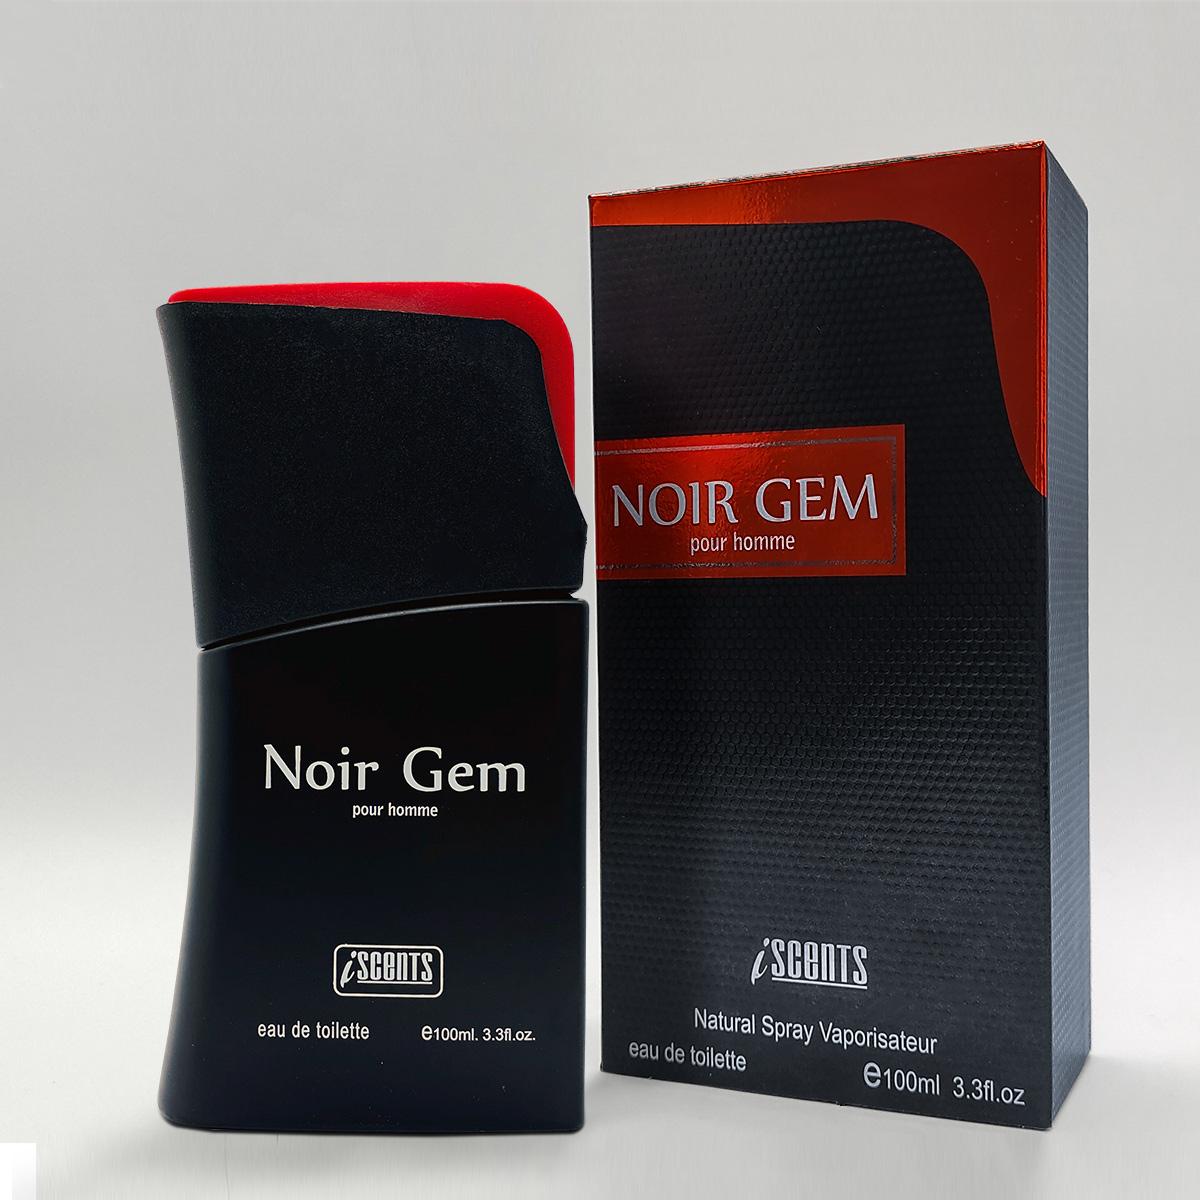 Perfume Noir Gem Masculino edt 100ml - I Scents